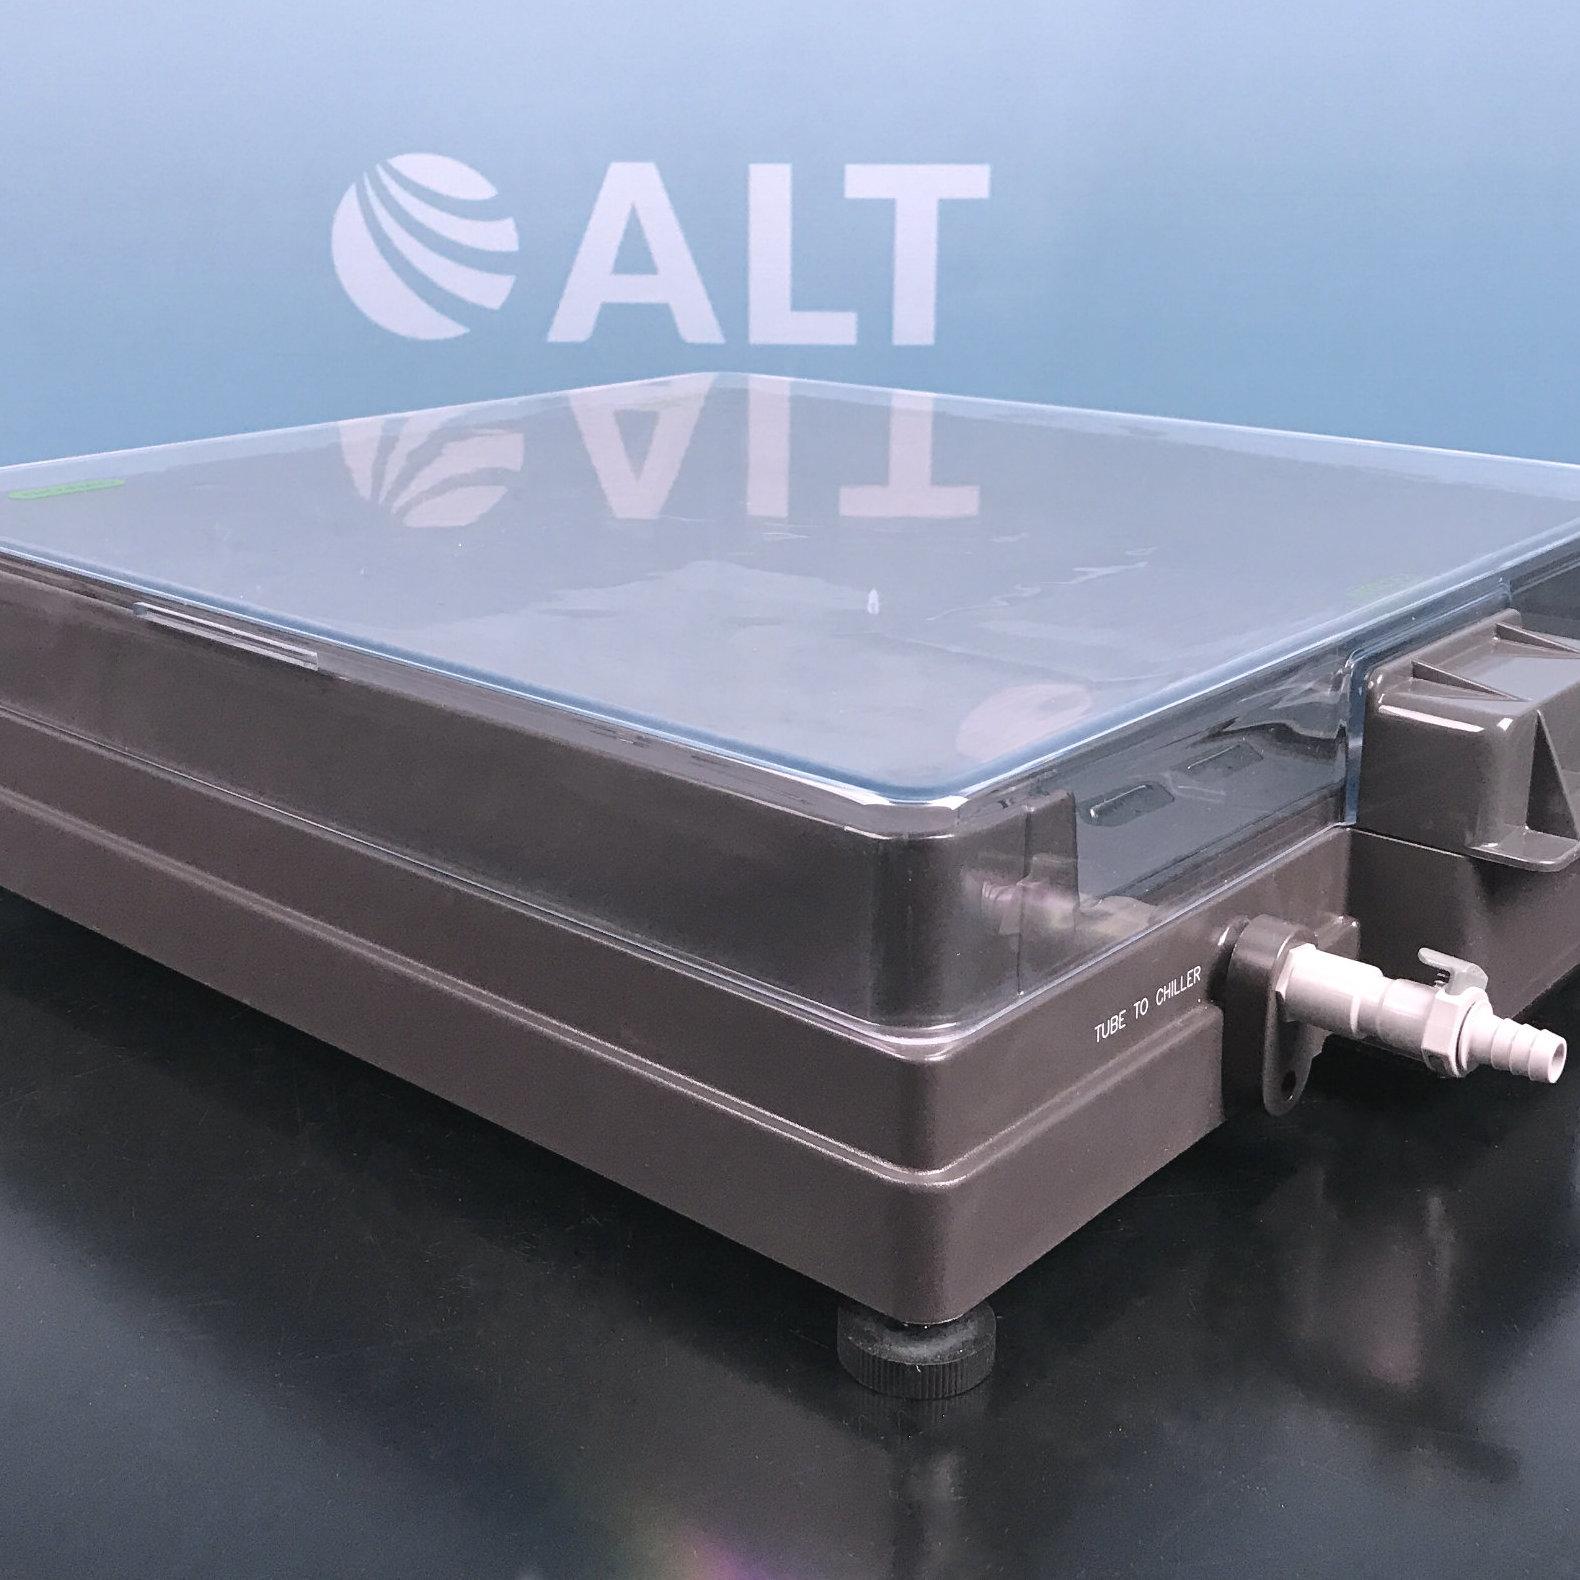 Bio-Rad Genepath Electrophoresis Gel Cell Image